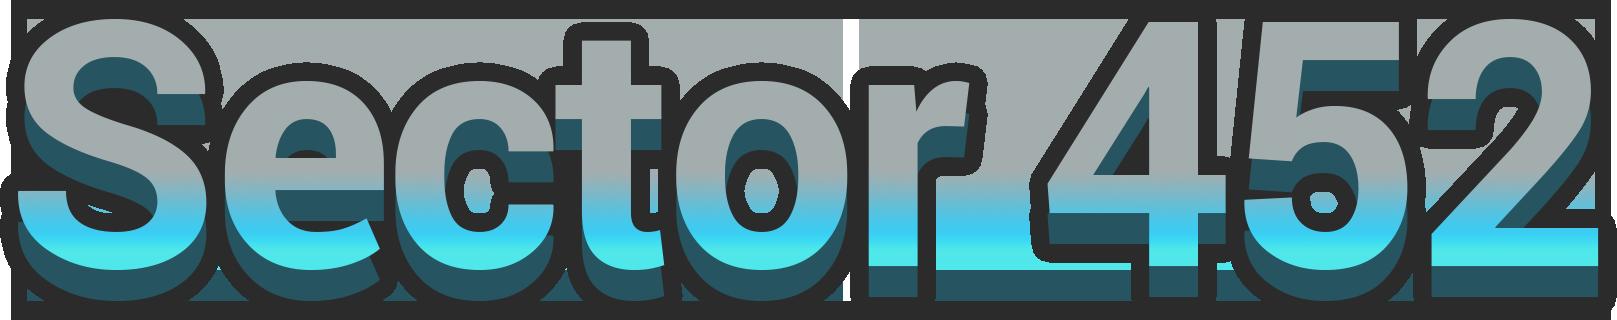 Sector452 Logo